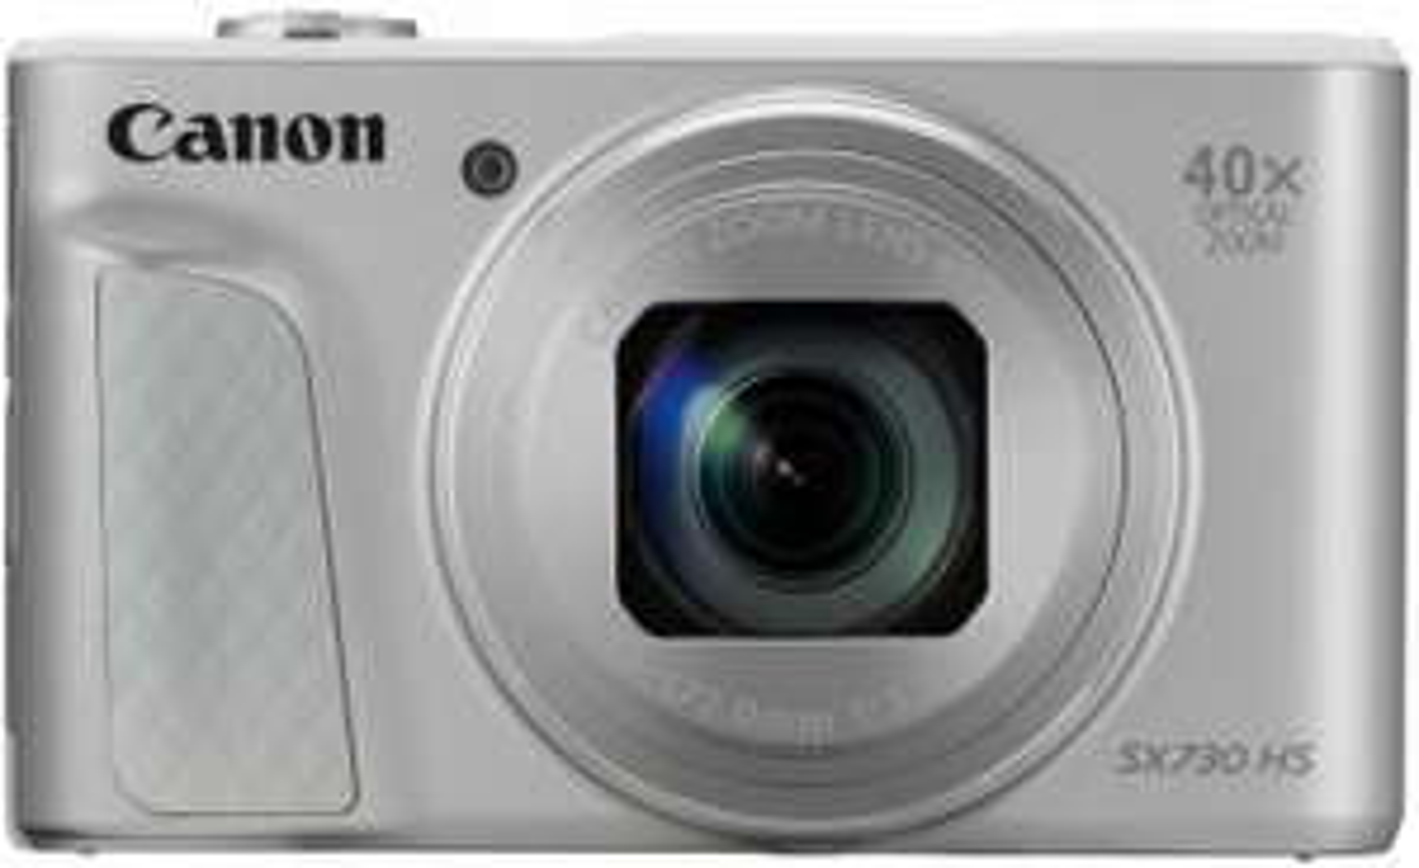 Canon PowerShot SX730 HS Digitalkamera (7,5cm (3 Zoll) 20,3 MP CMOS-Sensor, LCD-Display, 40 fach Zoom, Full HD, WLAN, Bluetooth) silber